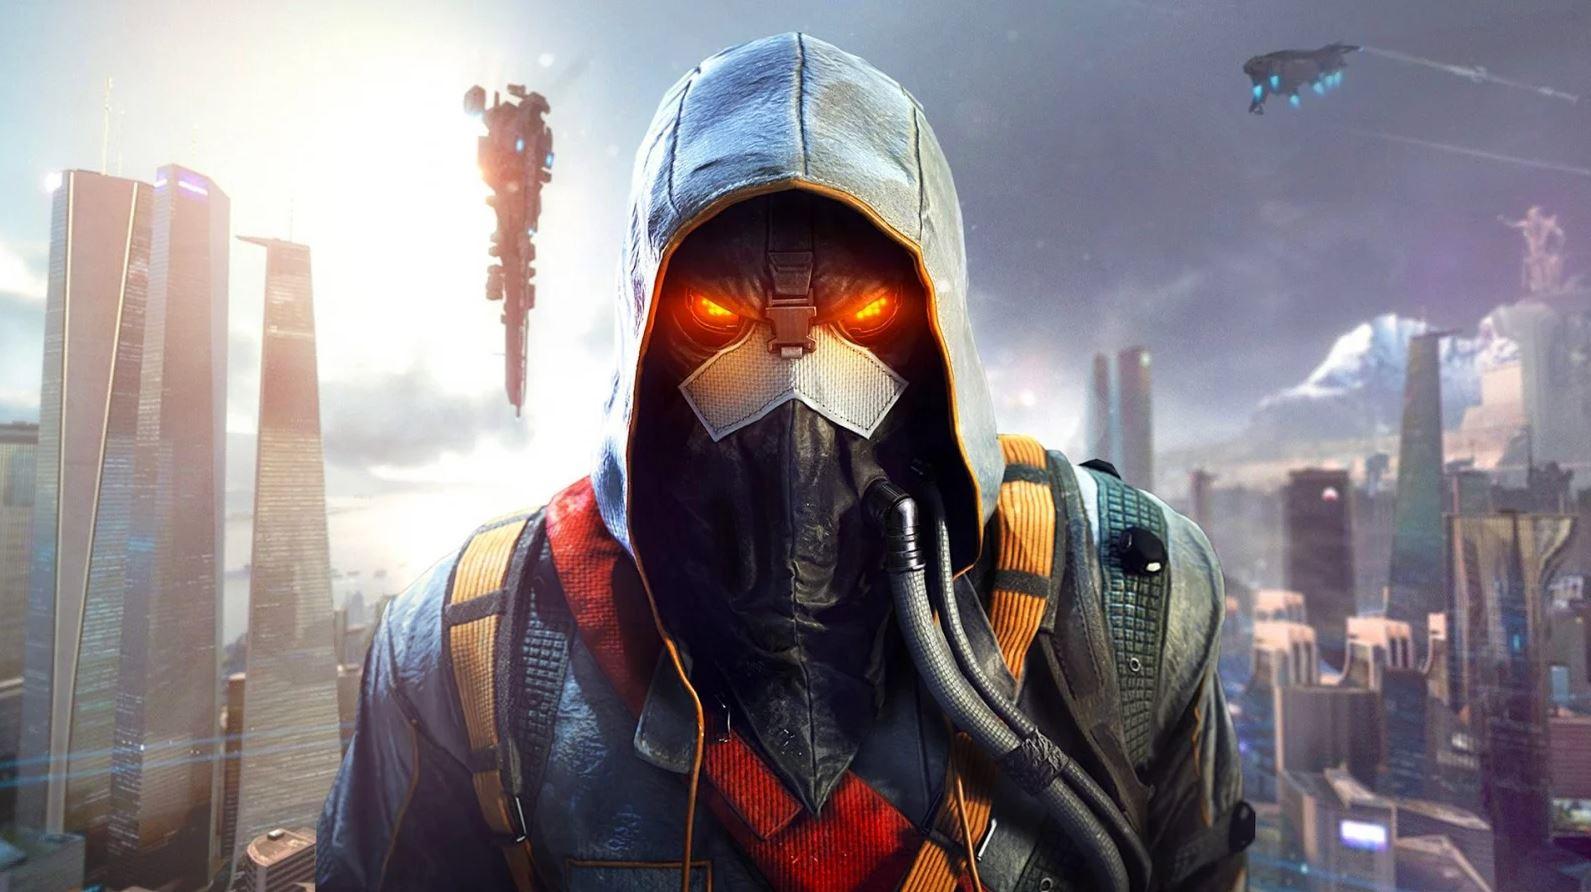 killzone-franchise-future-on-ps5-looks-non-existent-as-sony-retires-killzone-website